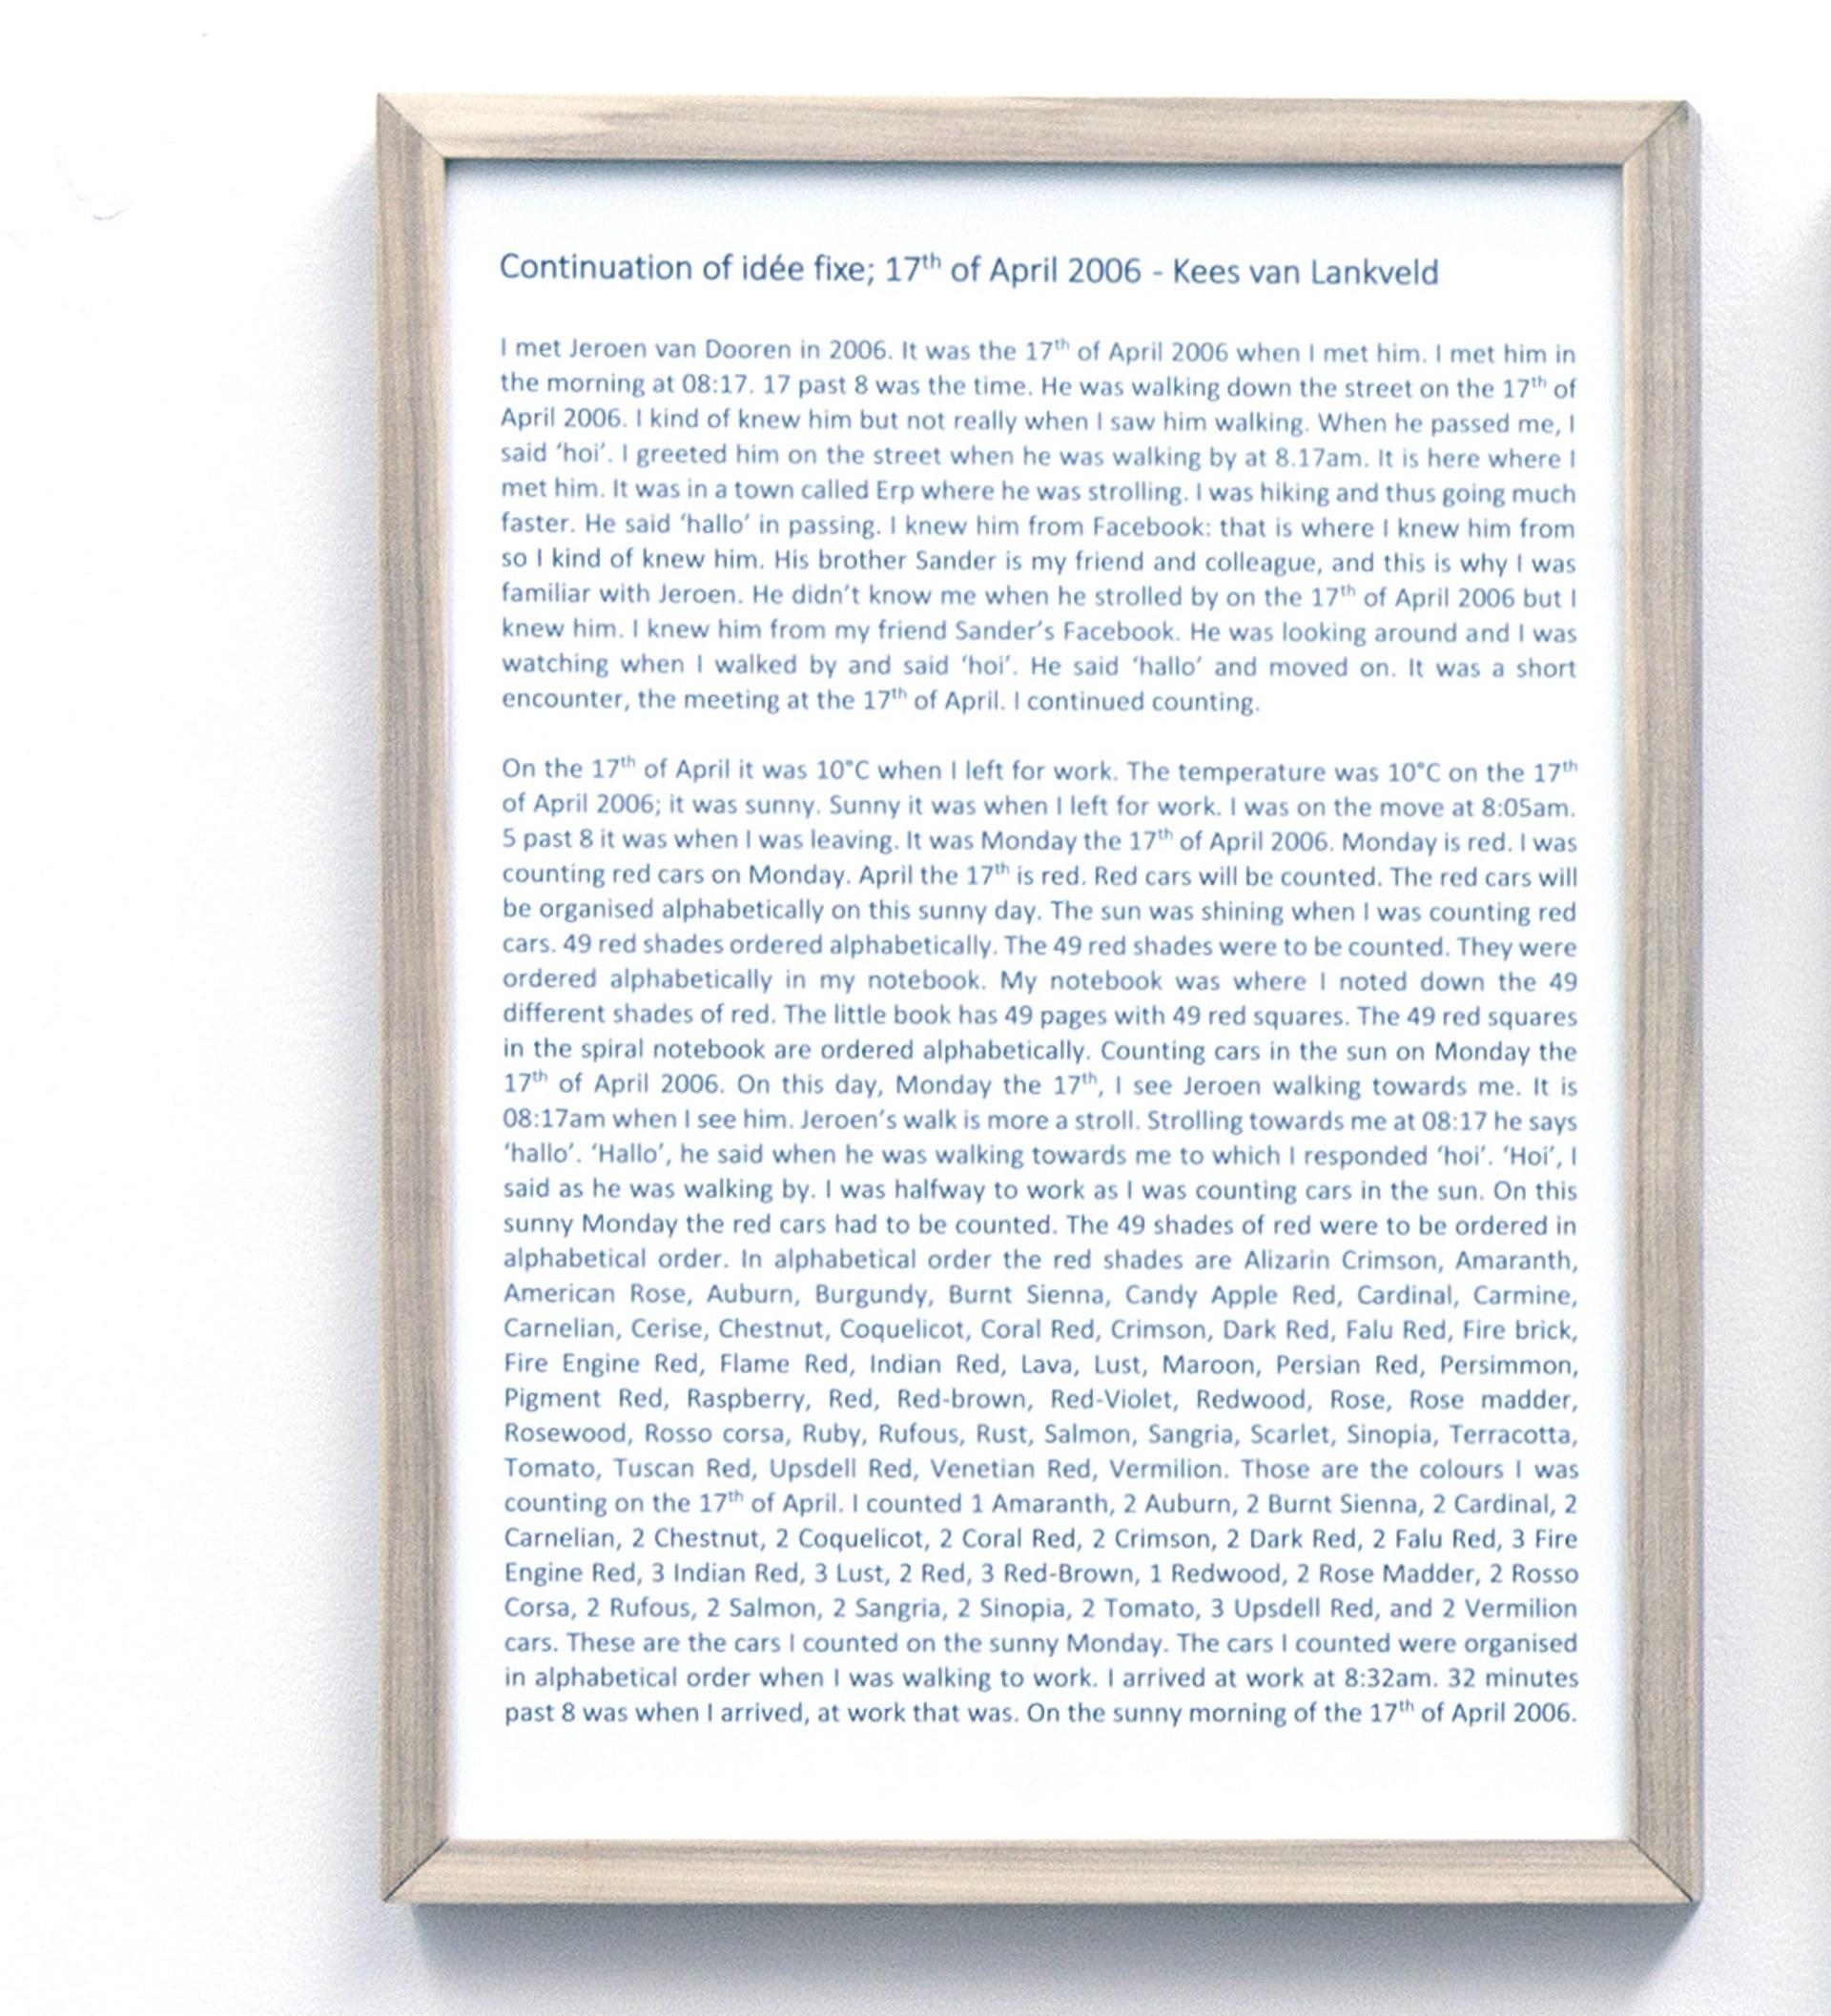 Kees van Lankveld, Continuation of idée fixe; 17th of April 2006